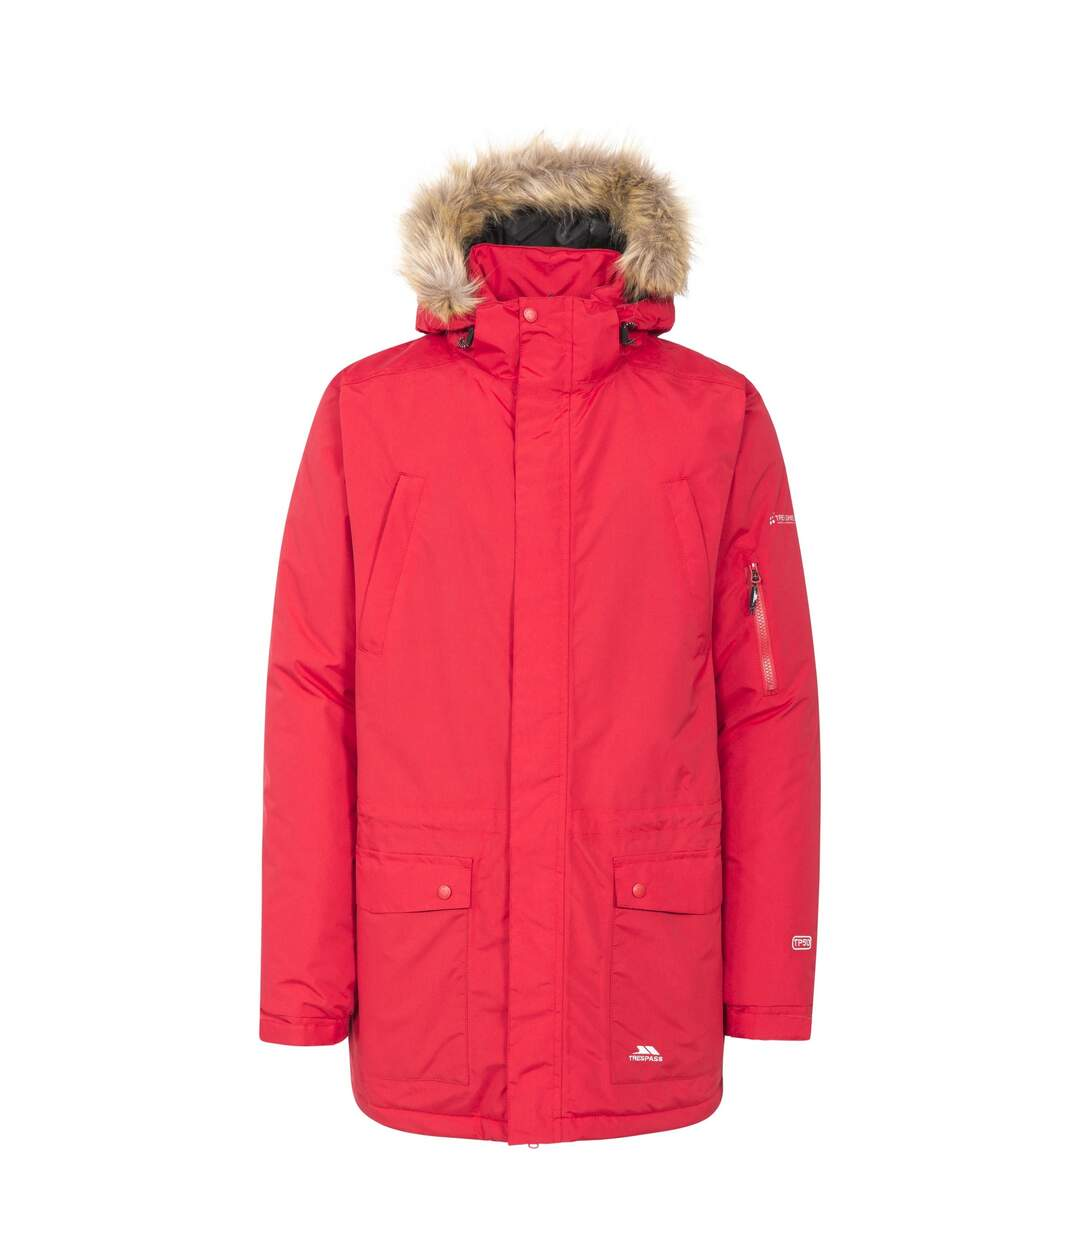 Trespass Mens Jaydin Waterproof Jacket (Red) - UTTP3571